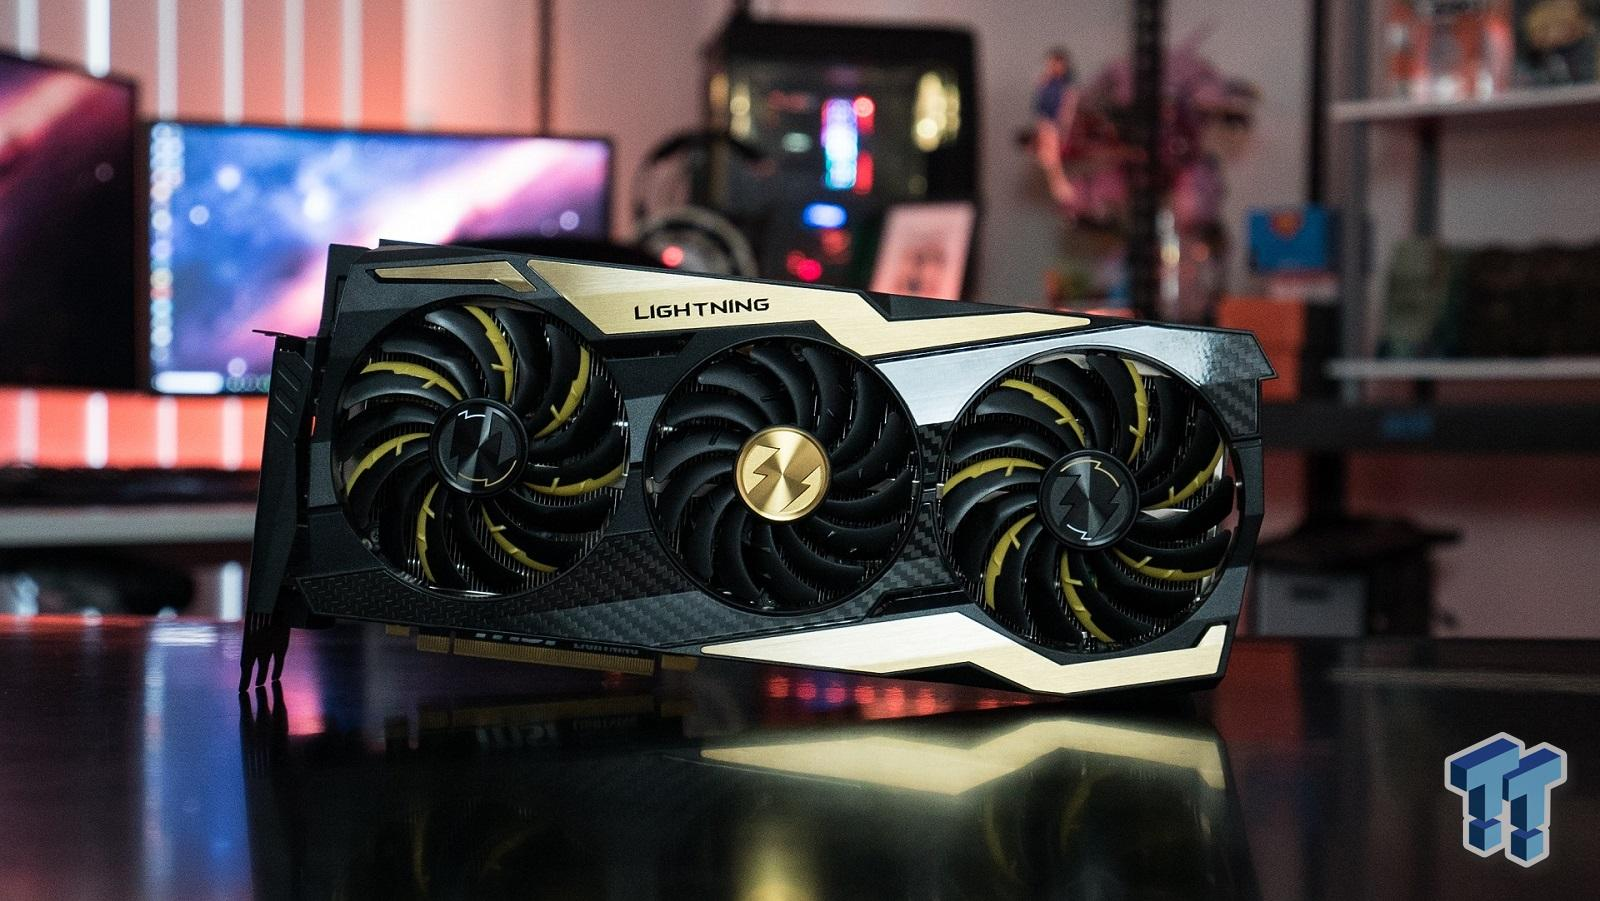 MSI GeForce RTX 2080 Ti LIGHTNING Z: Holy Balls of Steel